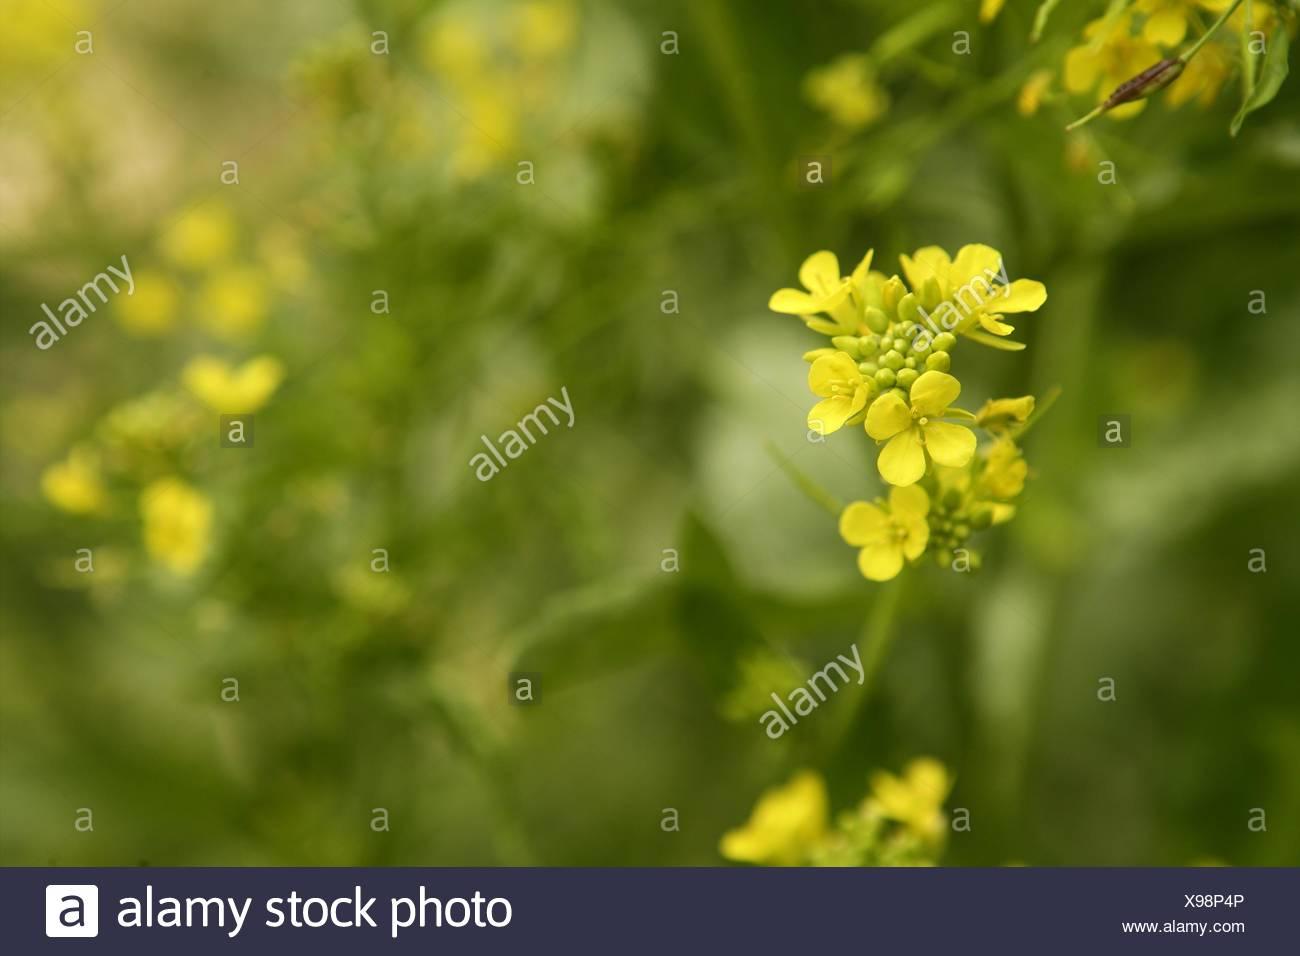 Mustard flower sinapis aiba yellow flowers and plant nature stock mustard flower sinapis aiba yellow flowers and plant nature mightylinksfo